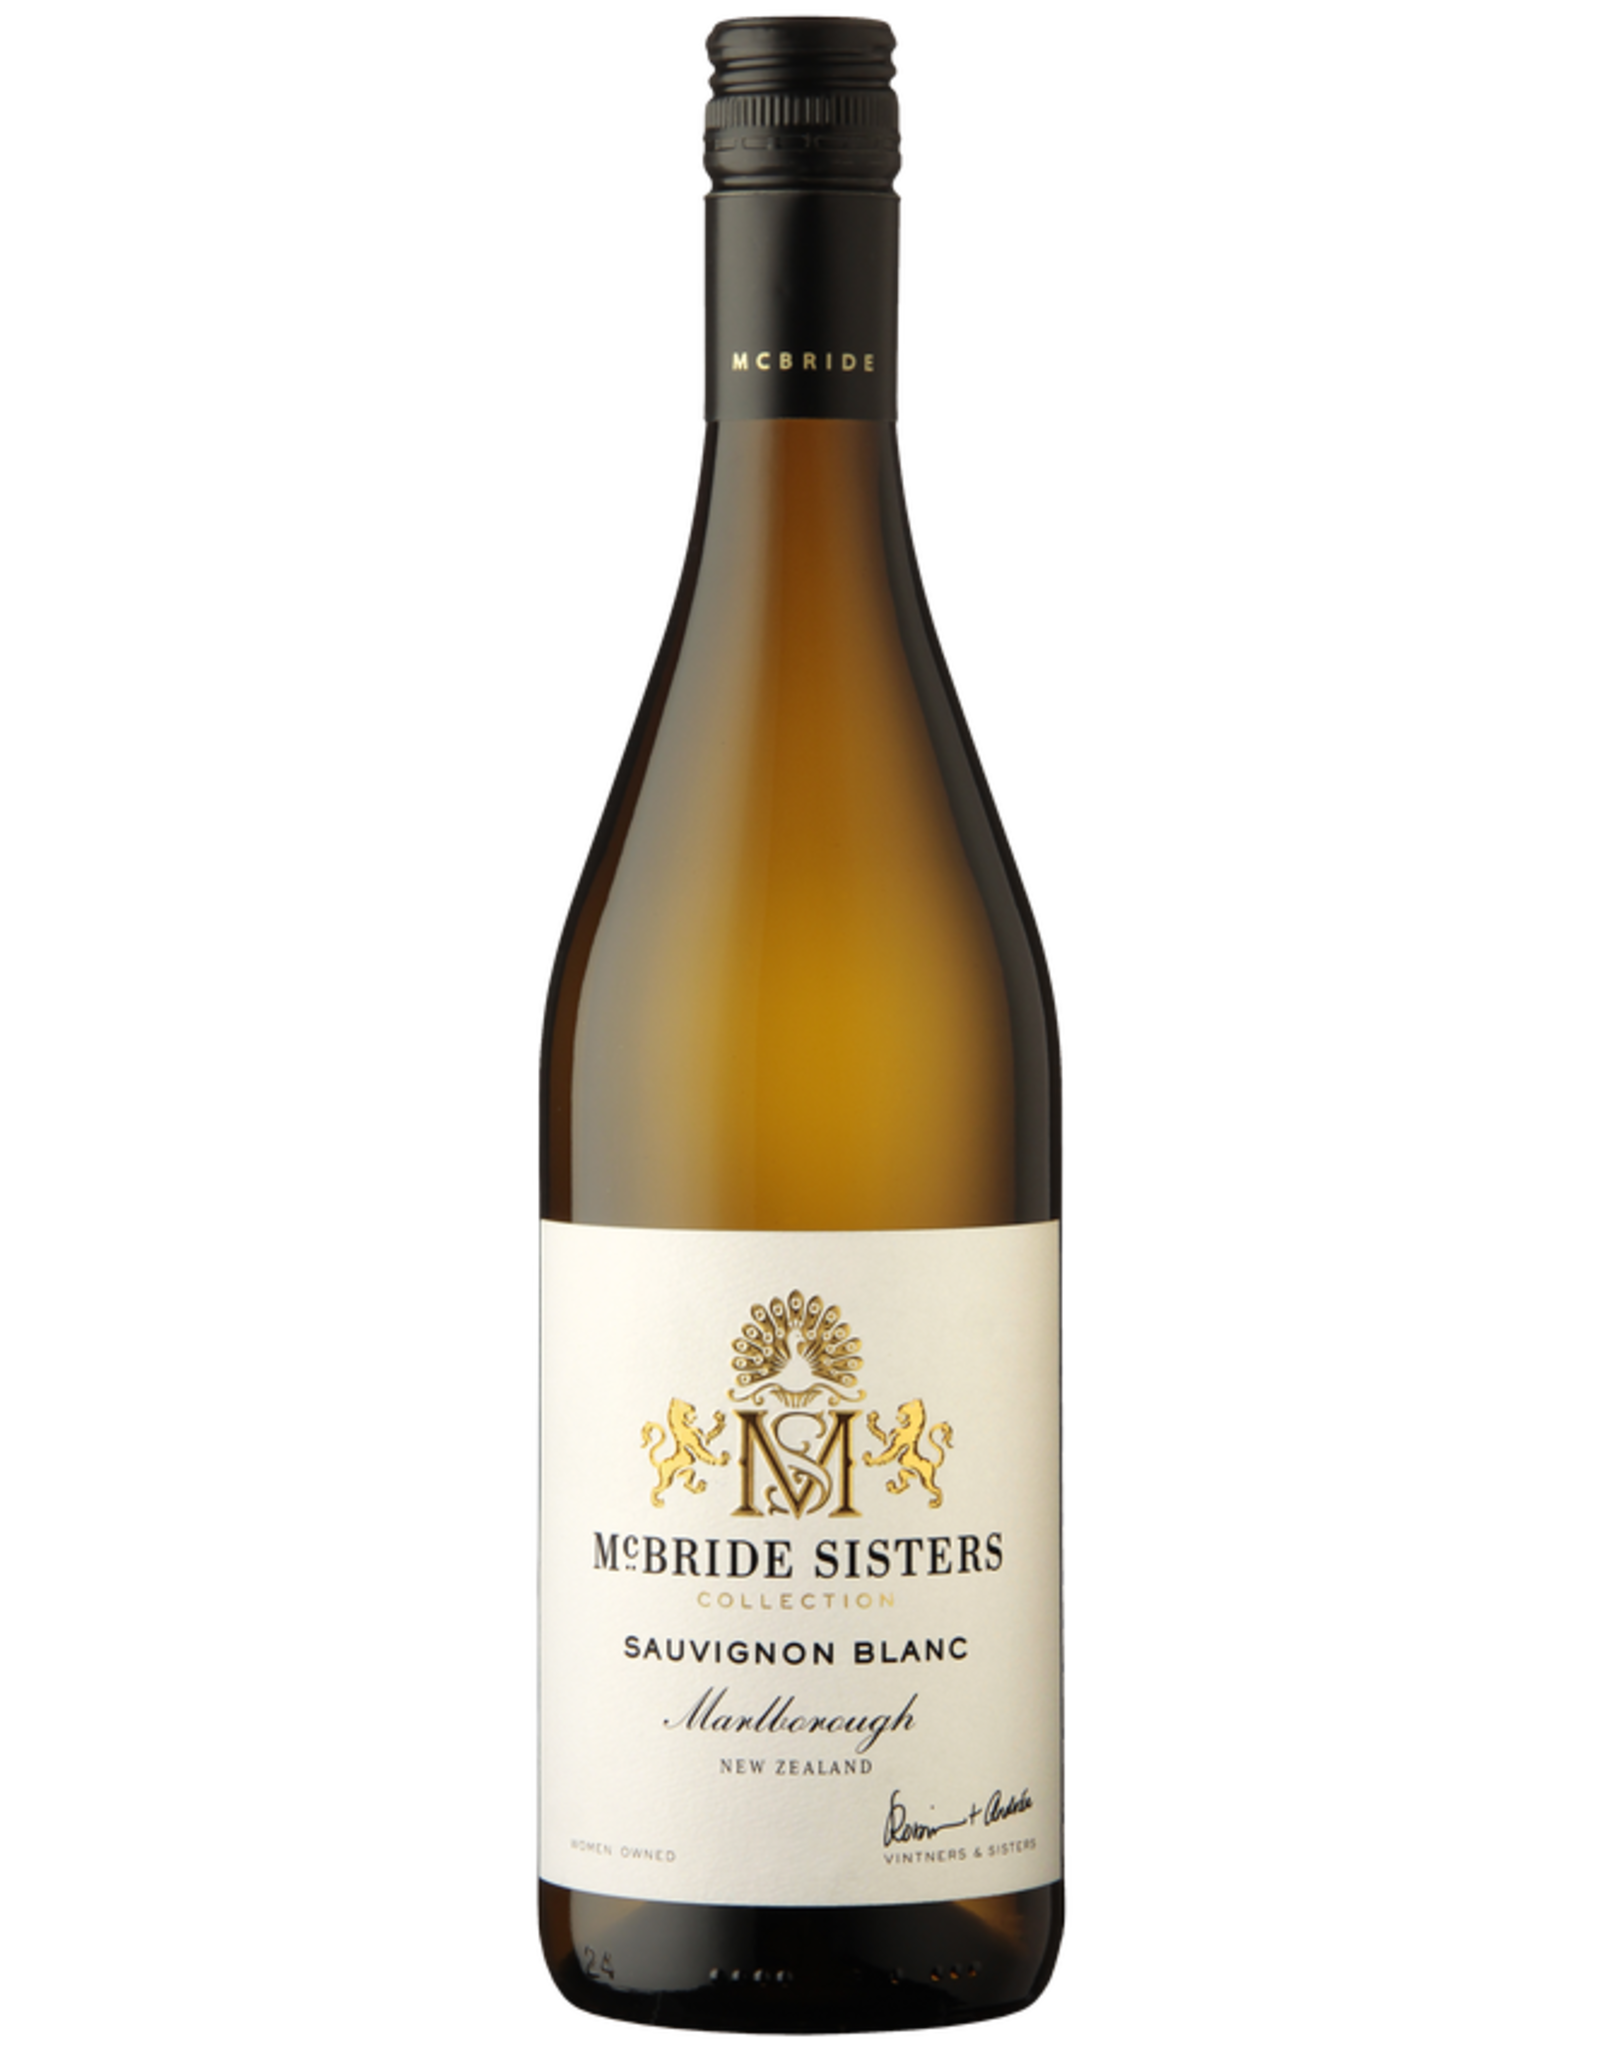 McBride Sisters Marlborough Sauvignon Blanc 2019